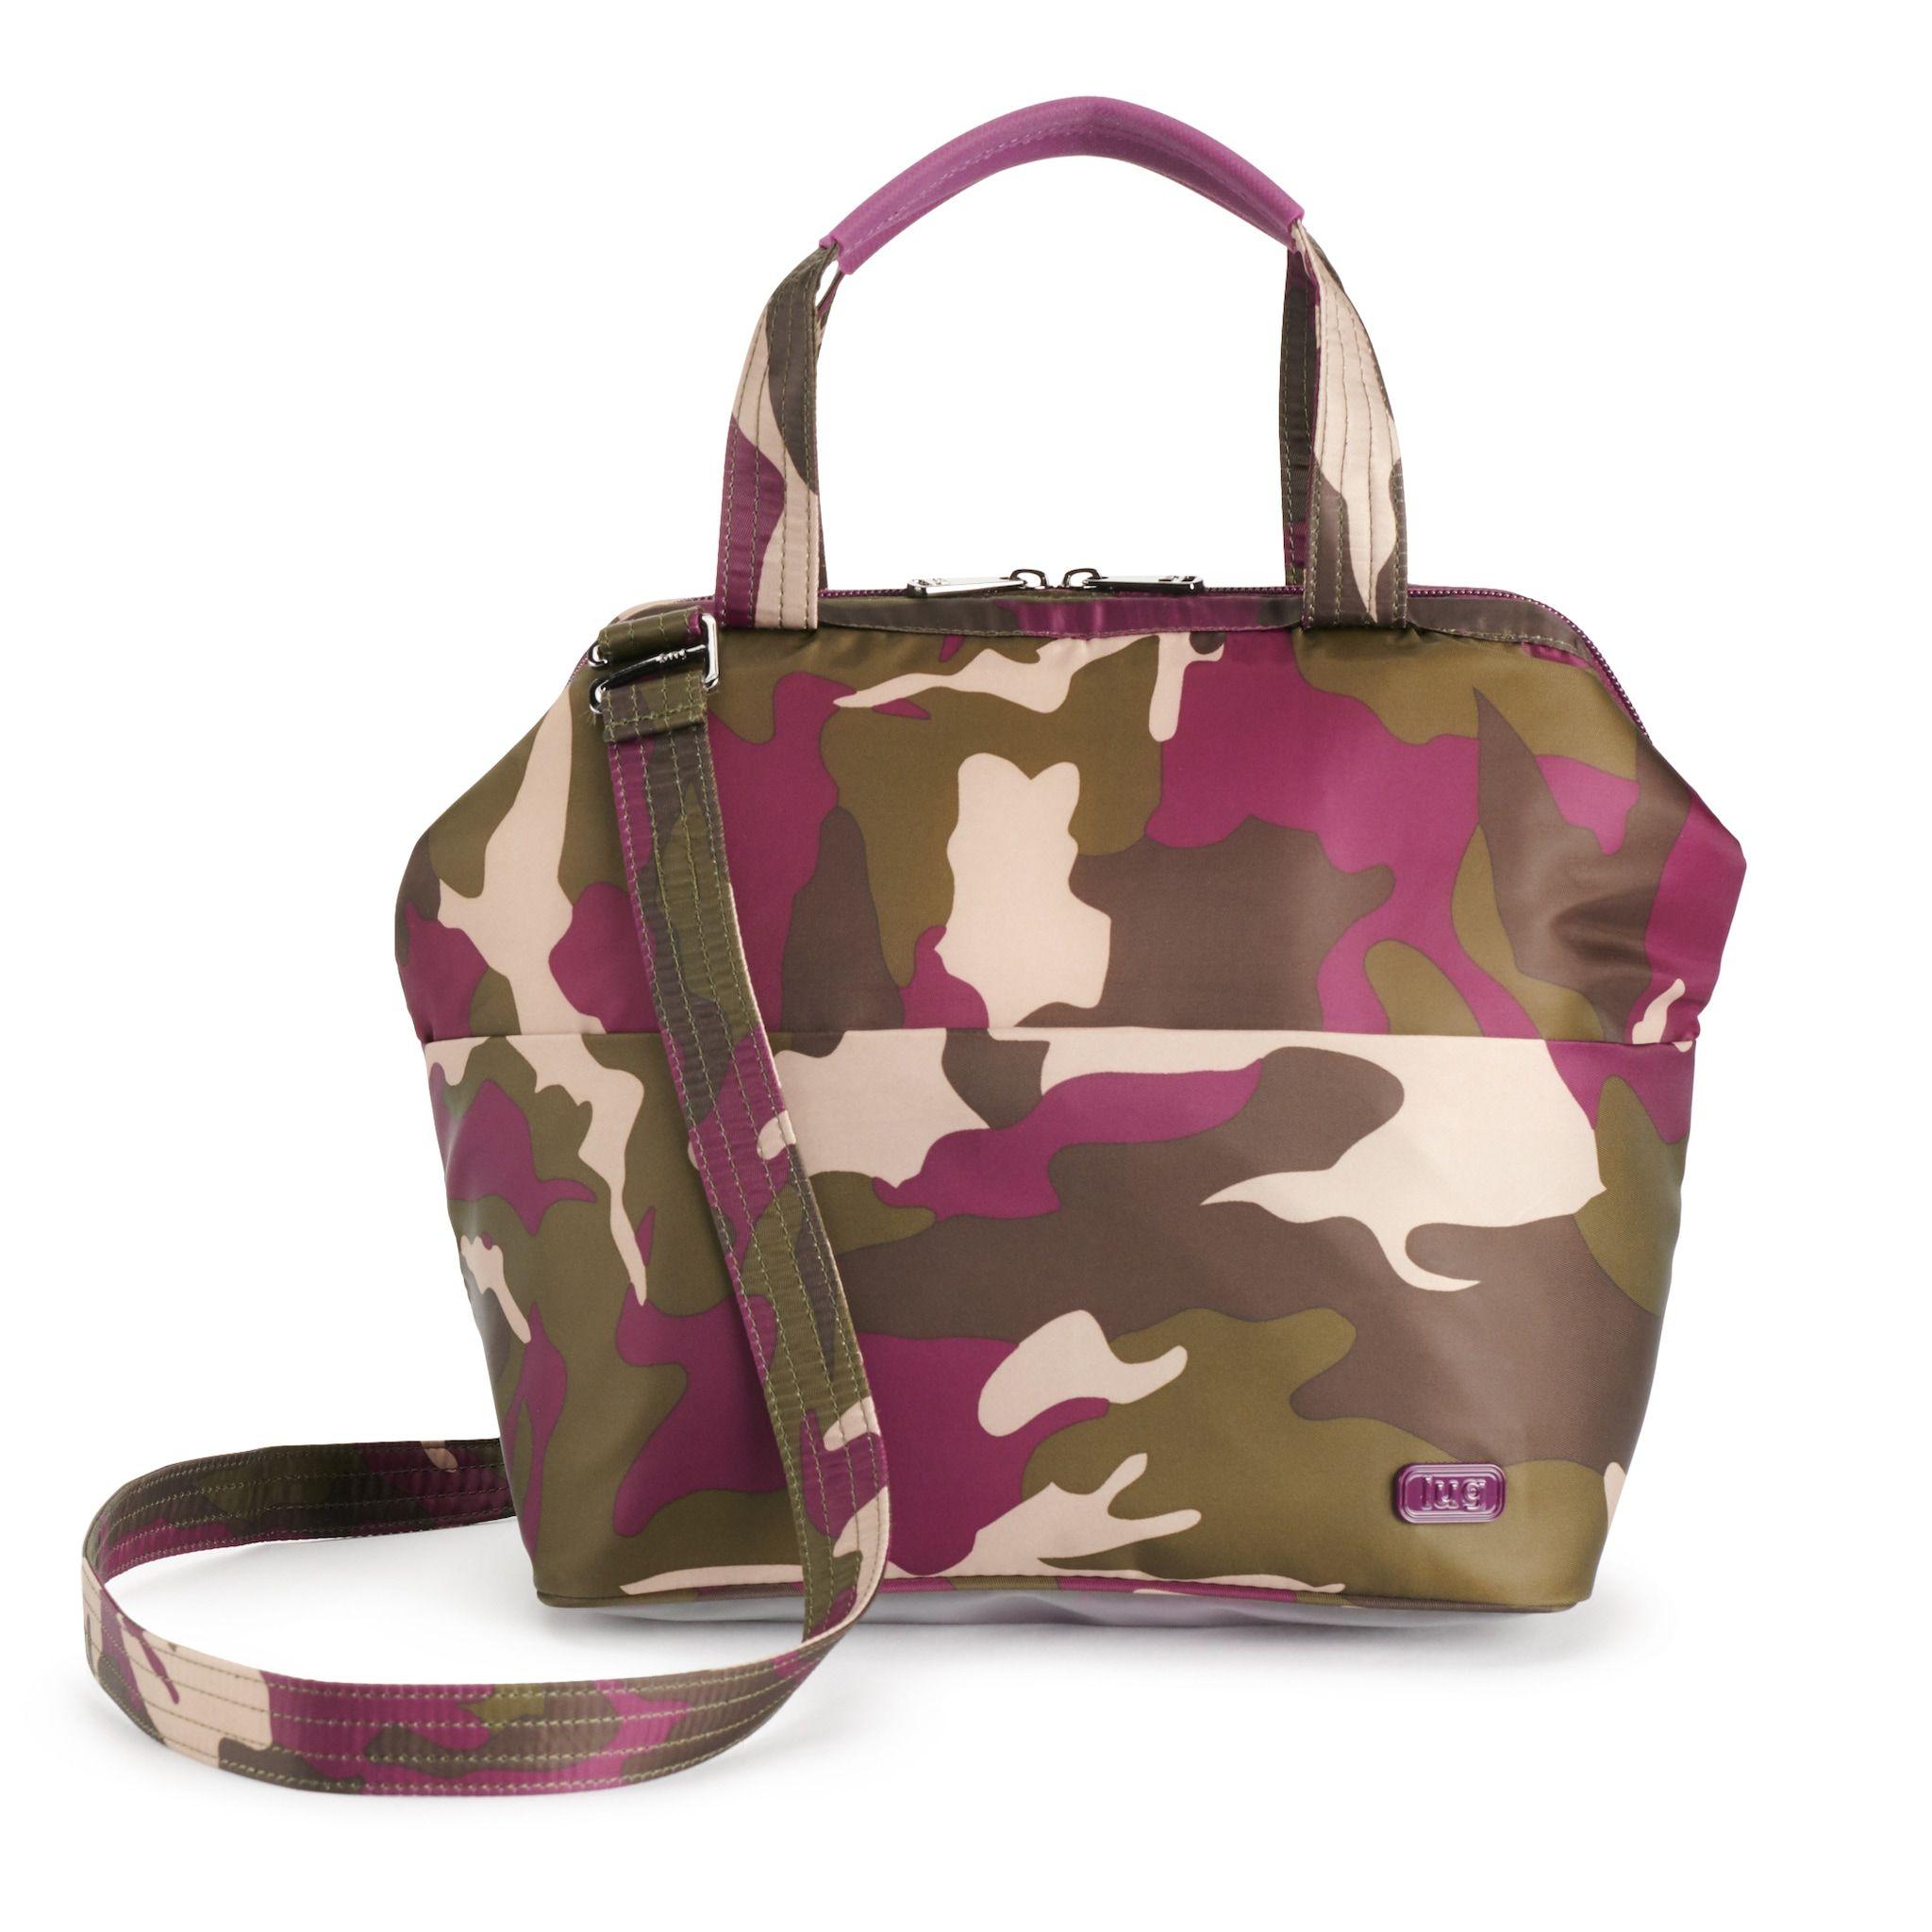 Lug chomper insulated lunch bag in 2020 lunch bag